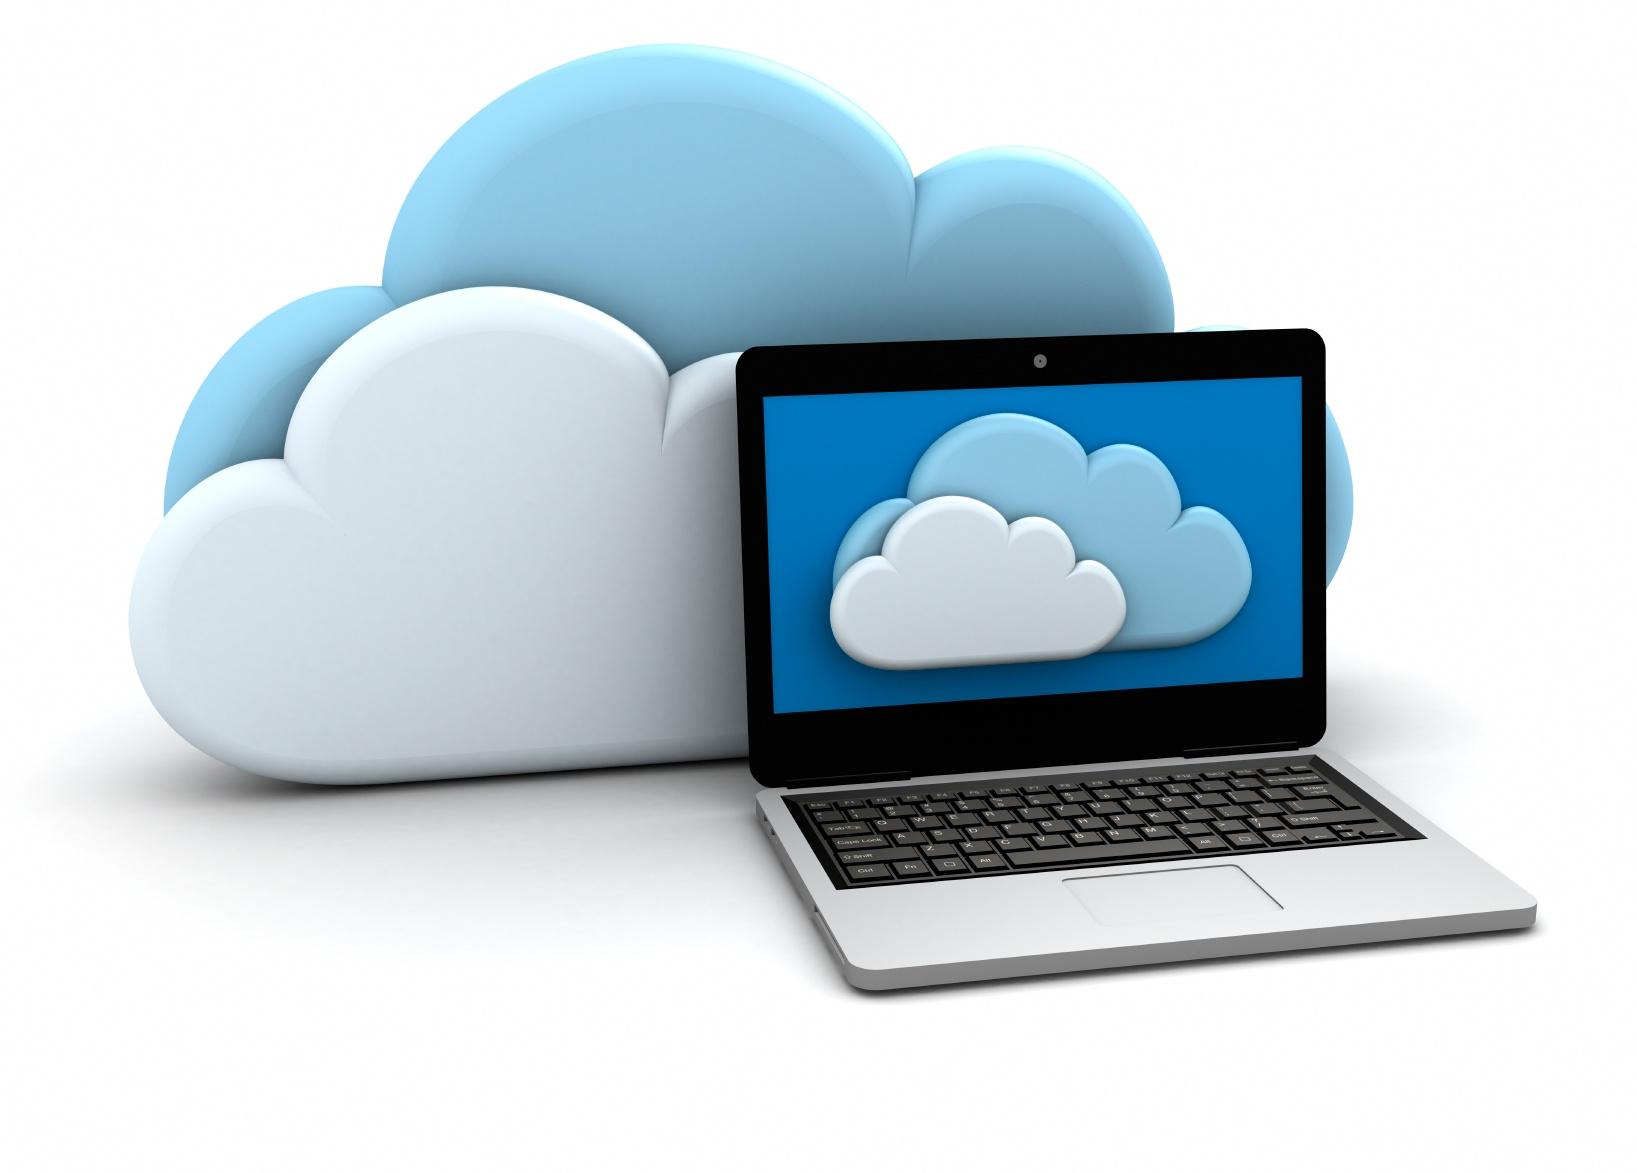 LifeStatus360 Builds Secure, Enterprise-Level Saas Platform with Alpha Anywhere